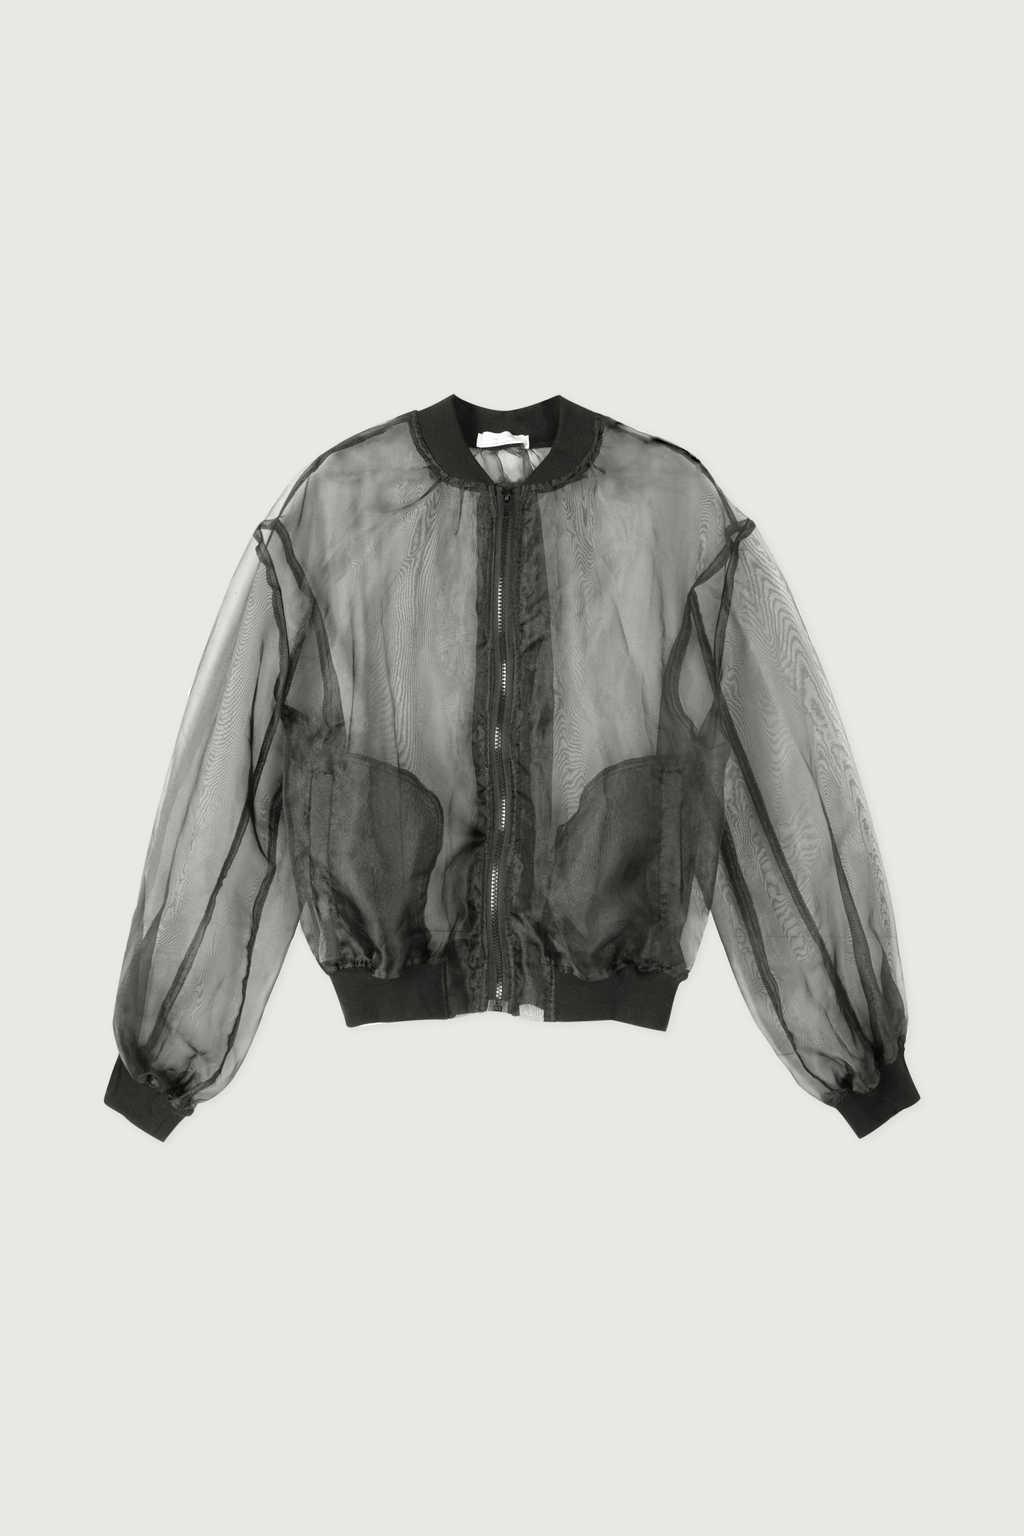 Jacket K007 Black 7